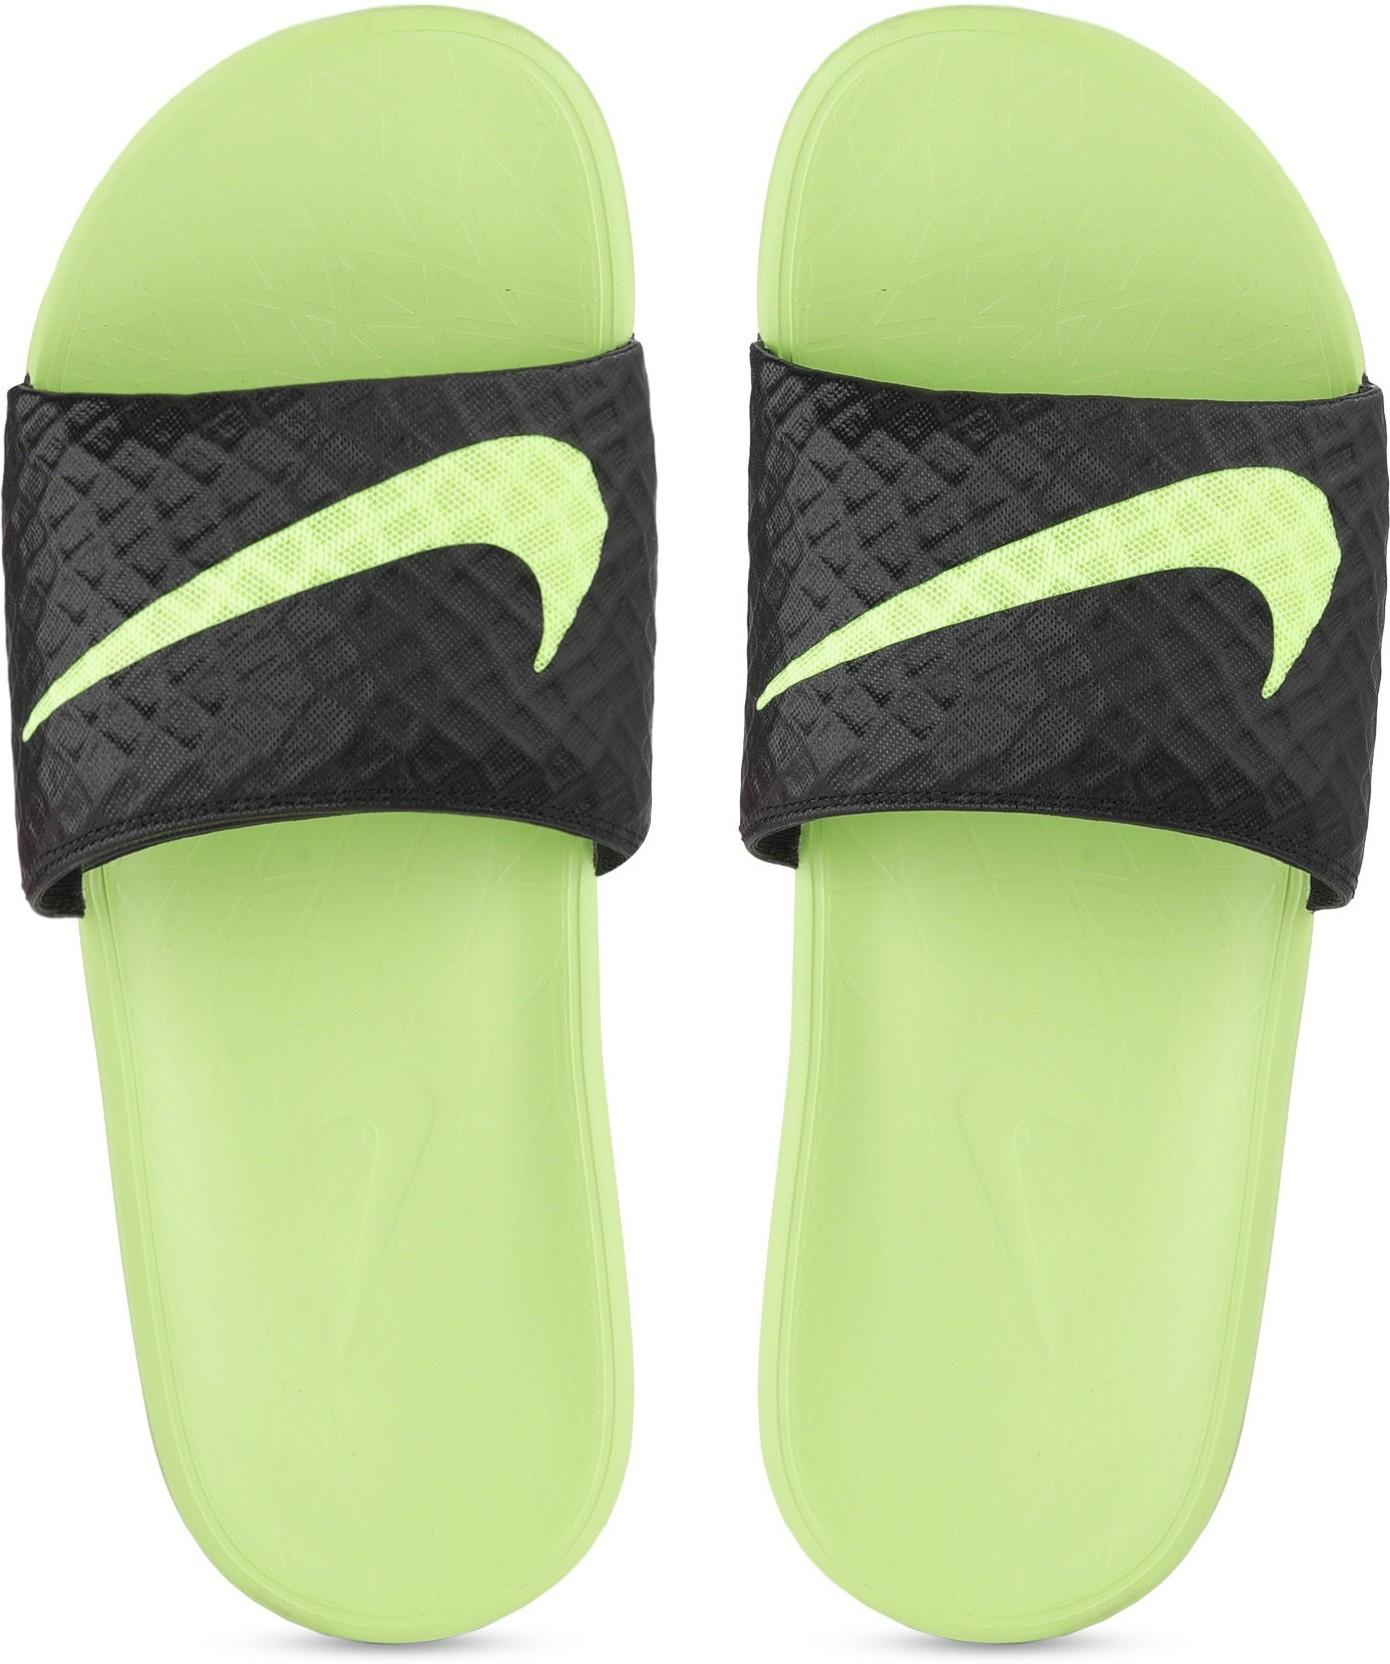 e5e5a71d23a Nike BENASSI SOLARSOFT Slides - Buy BLACK VOLT Color Nike BENASSI ...